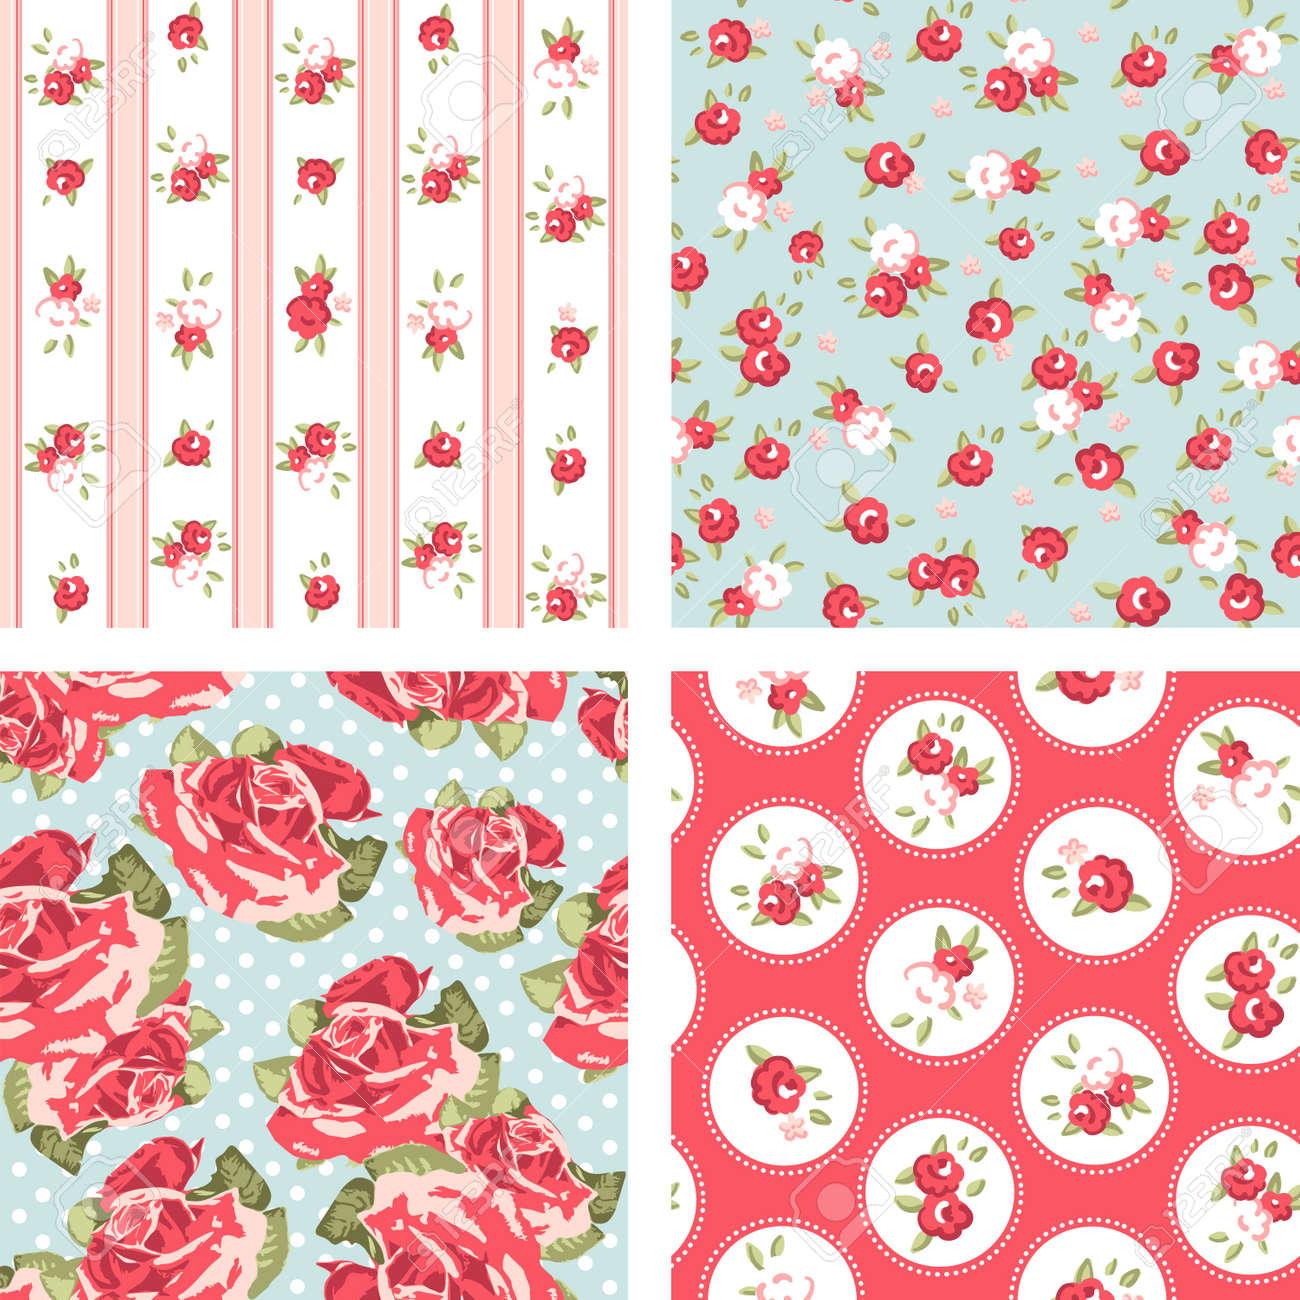 Shabby Chic set, 4 Vintage rose patterns Seamless Rose wallpaper Stock Vector - 14255157